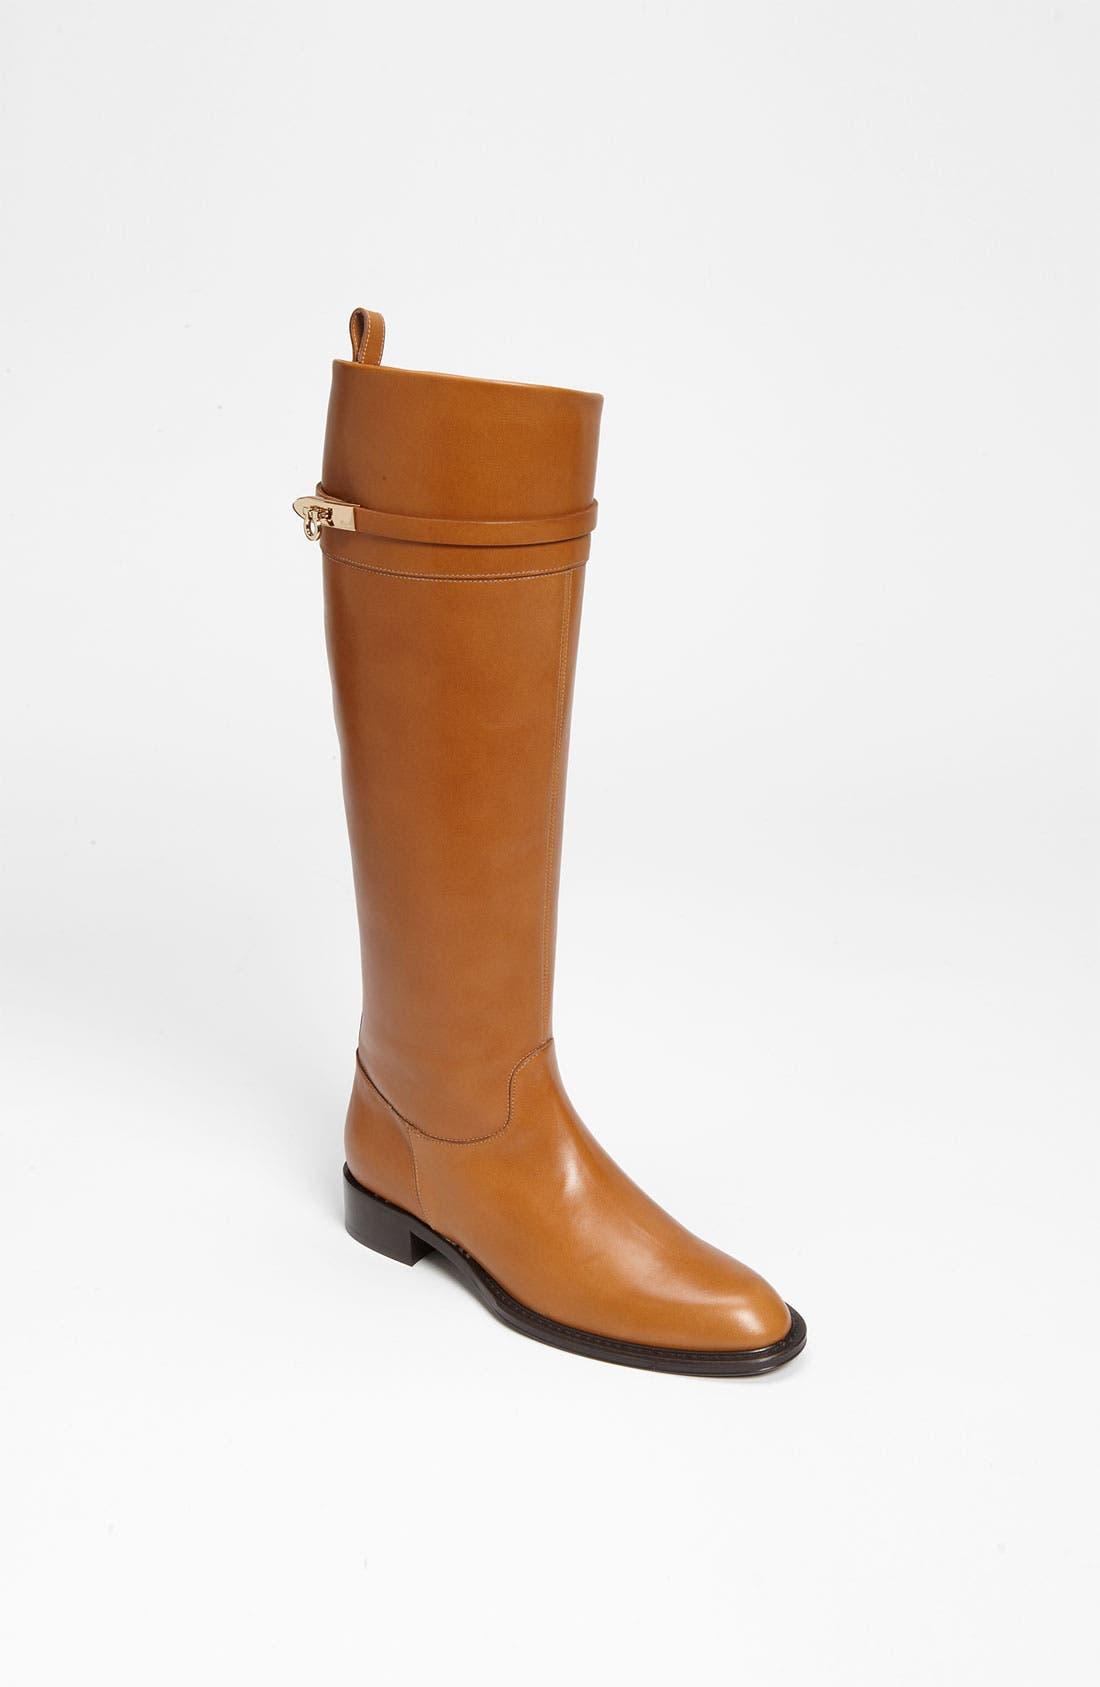 Alternate Image 1 Selected - Salvatore Ferragamo 'Calipso' Boot